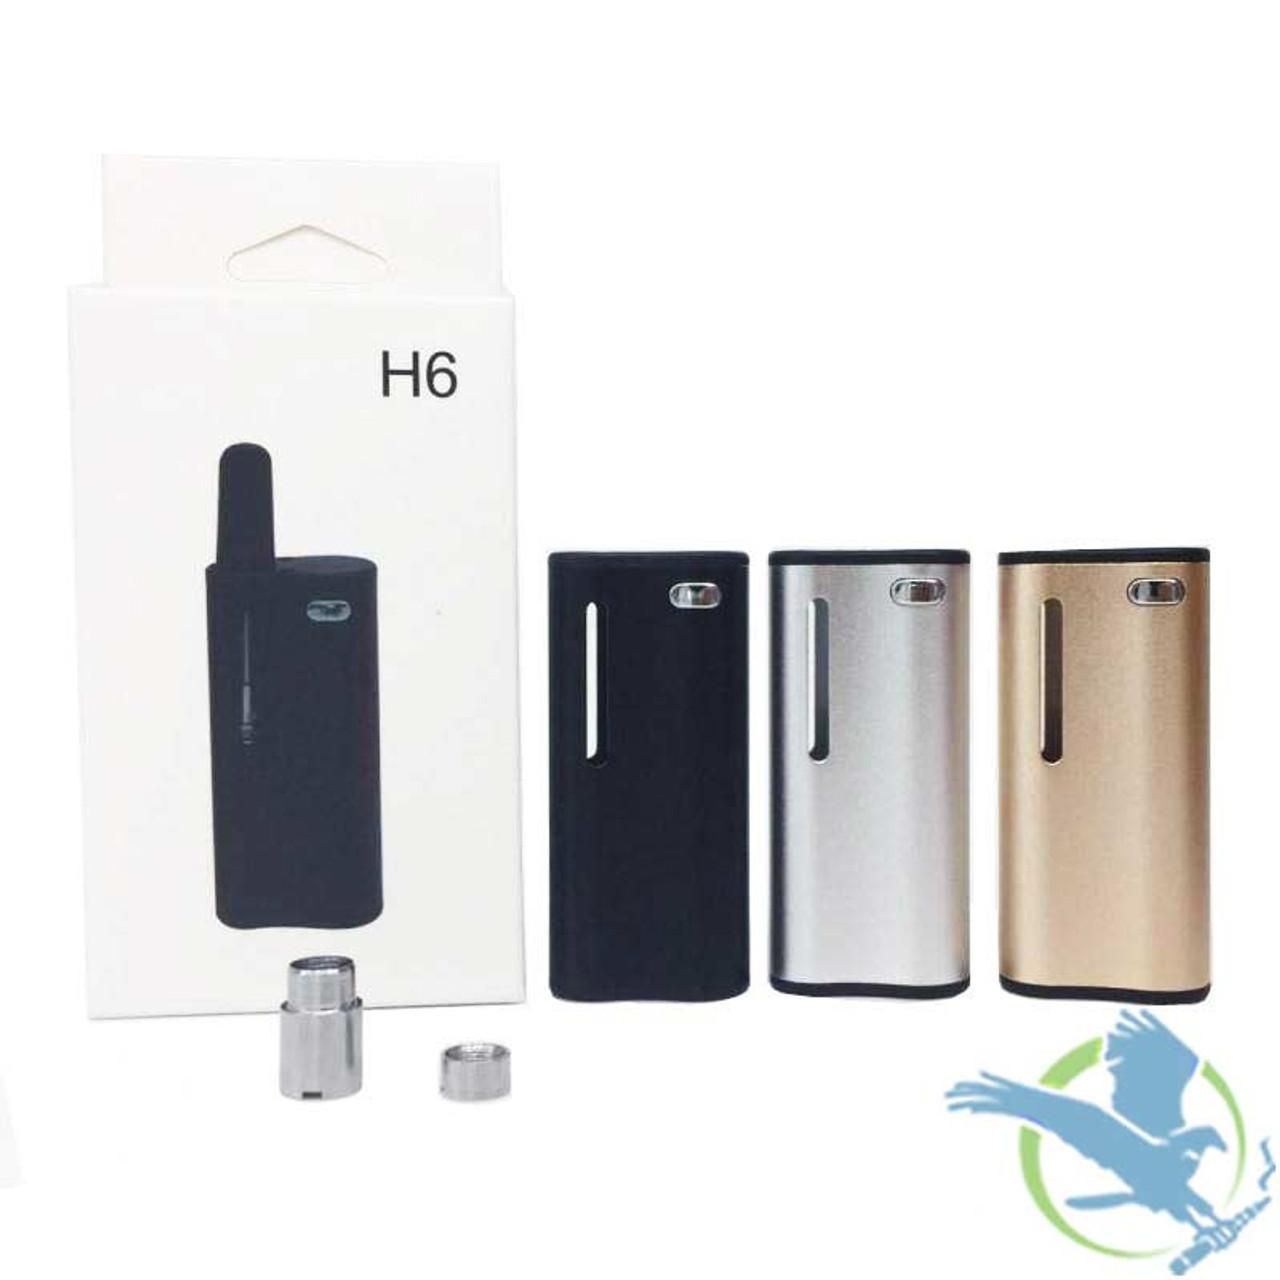 Hibron H6 Variable Voltage 350mAh Oil Vaporizer Kit (MSRP $15 00)